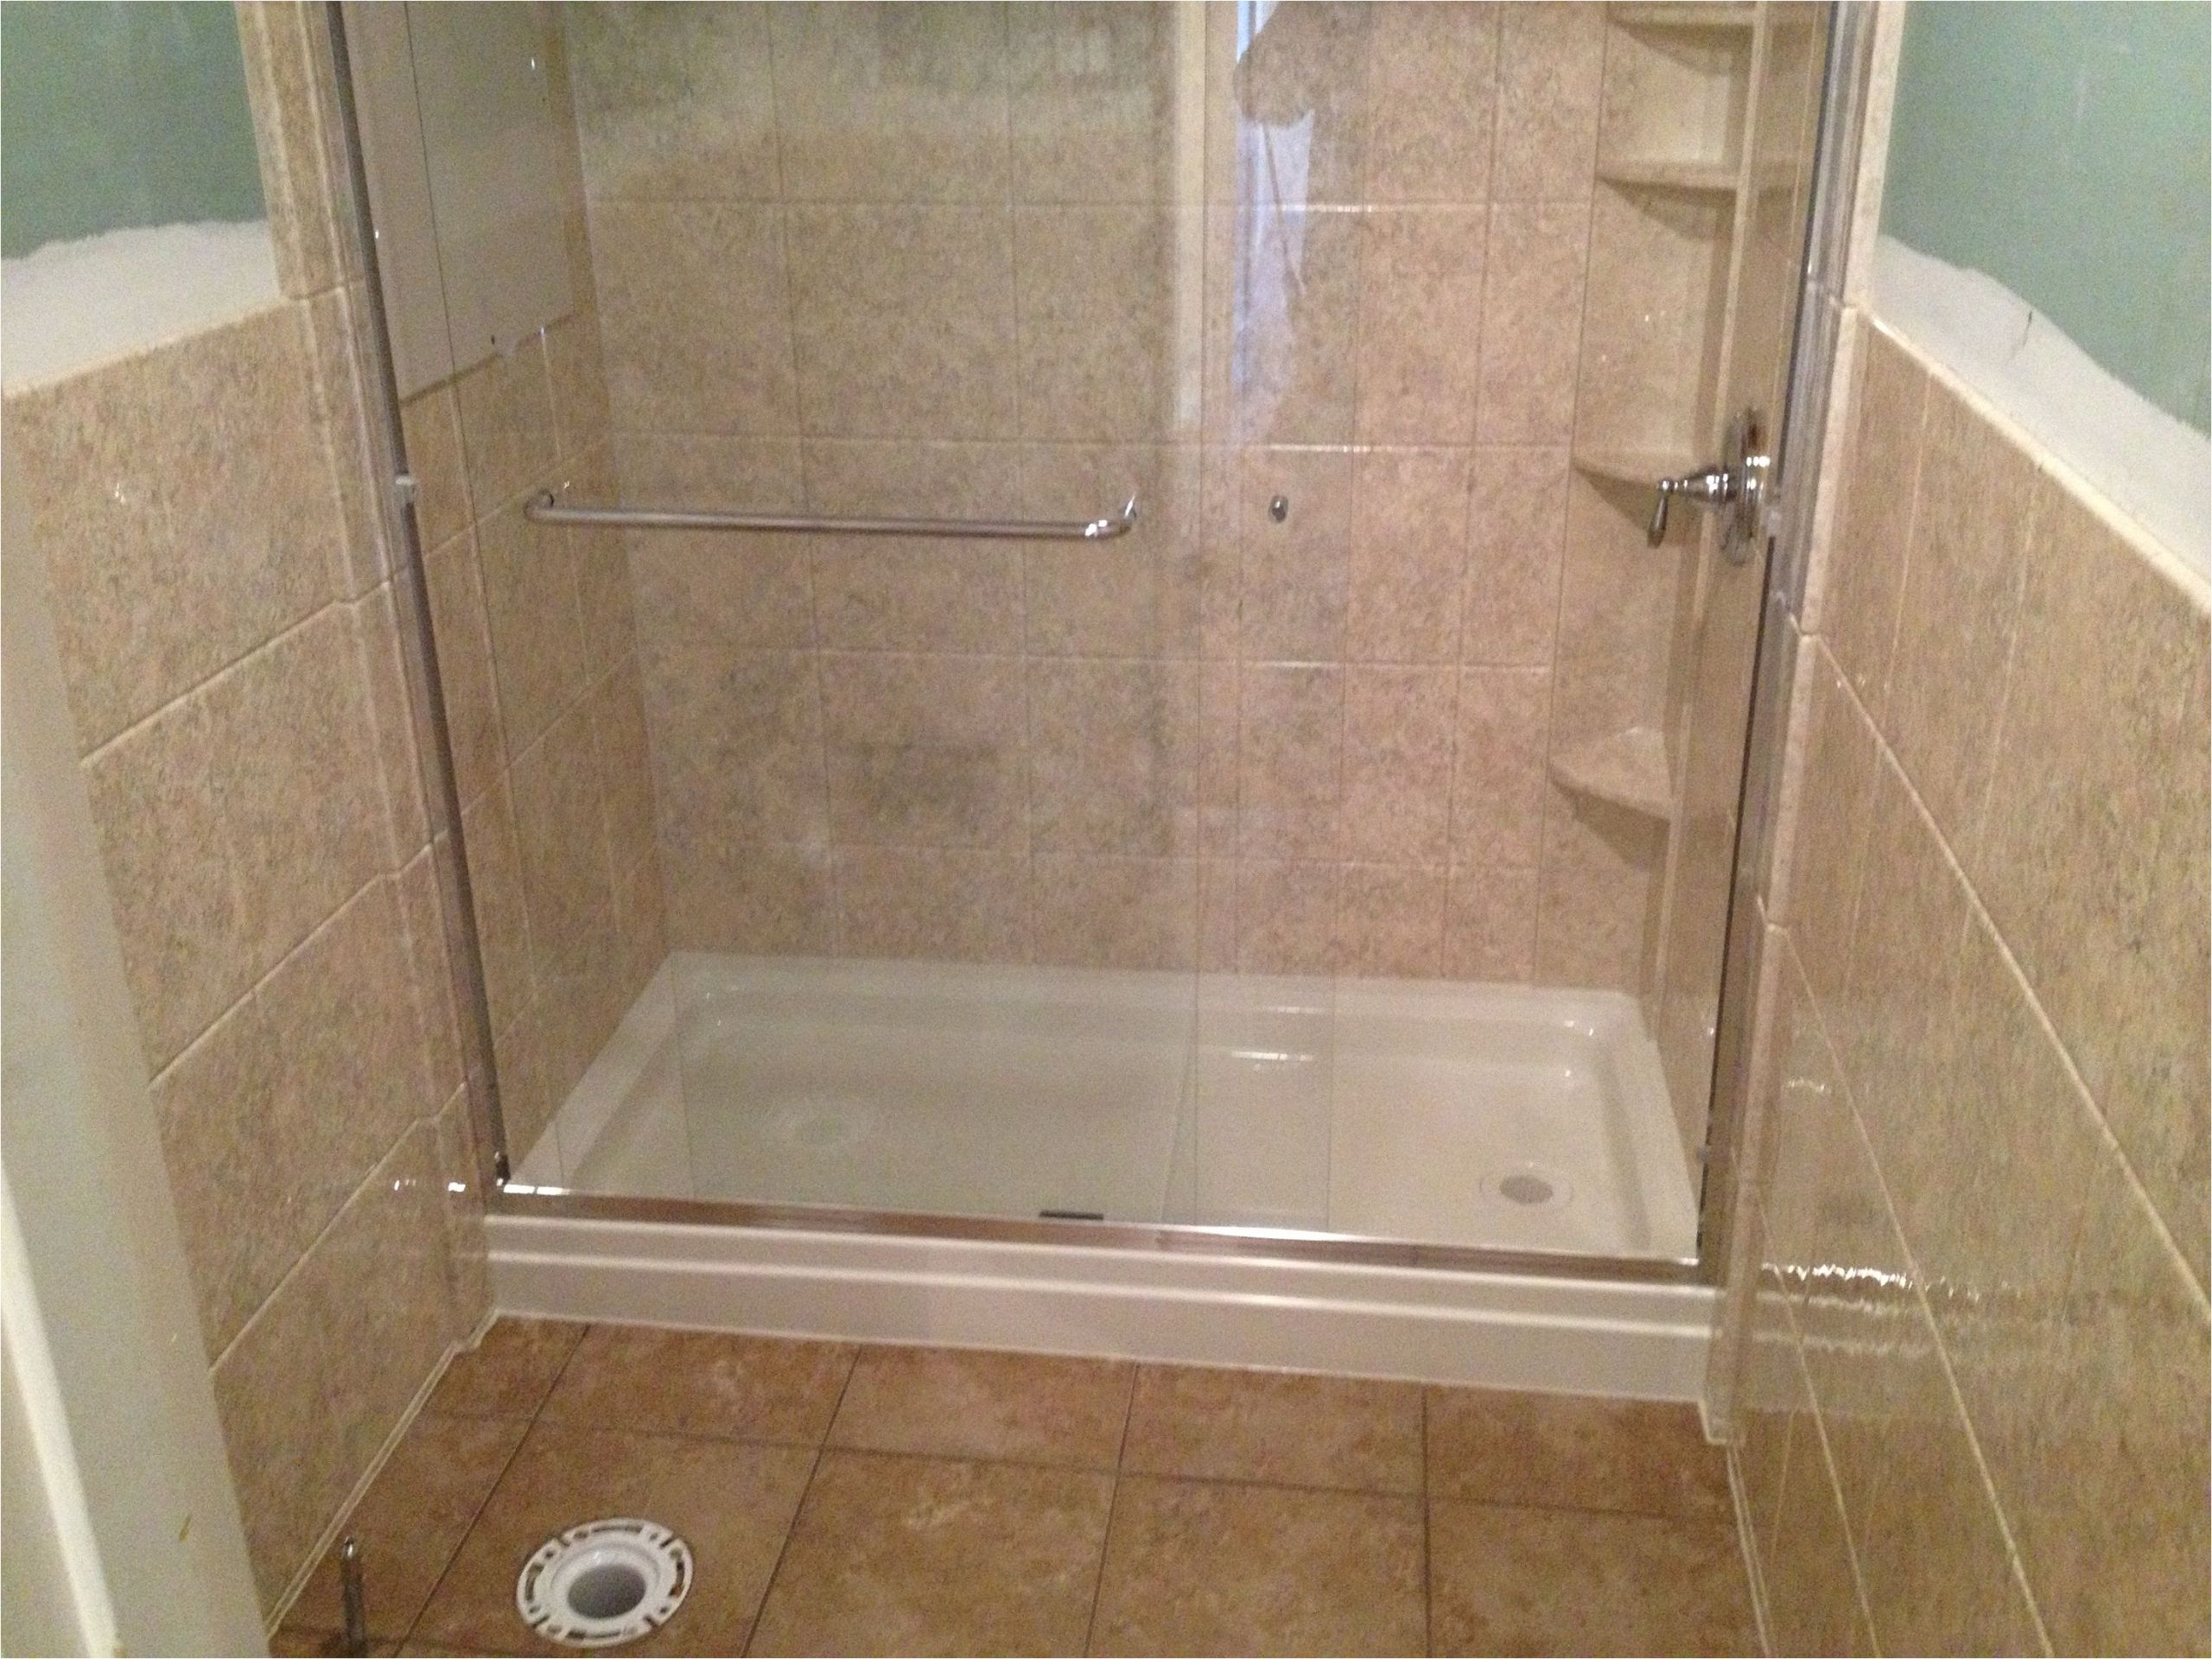 tub to shower conversion for remodeling bathroom design